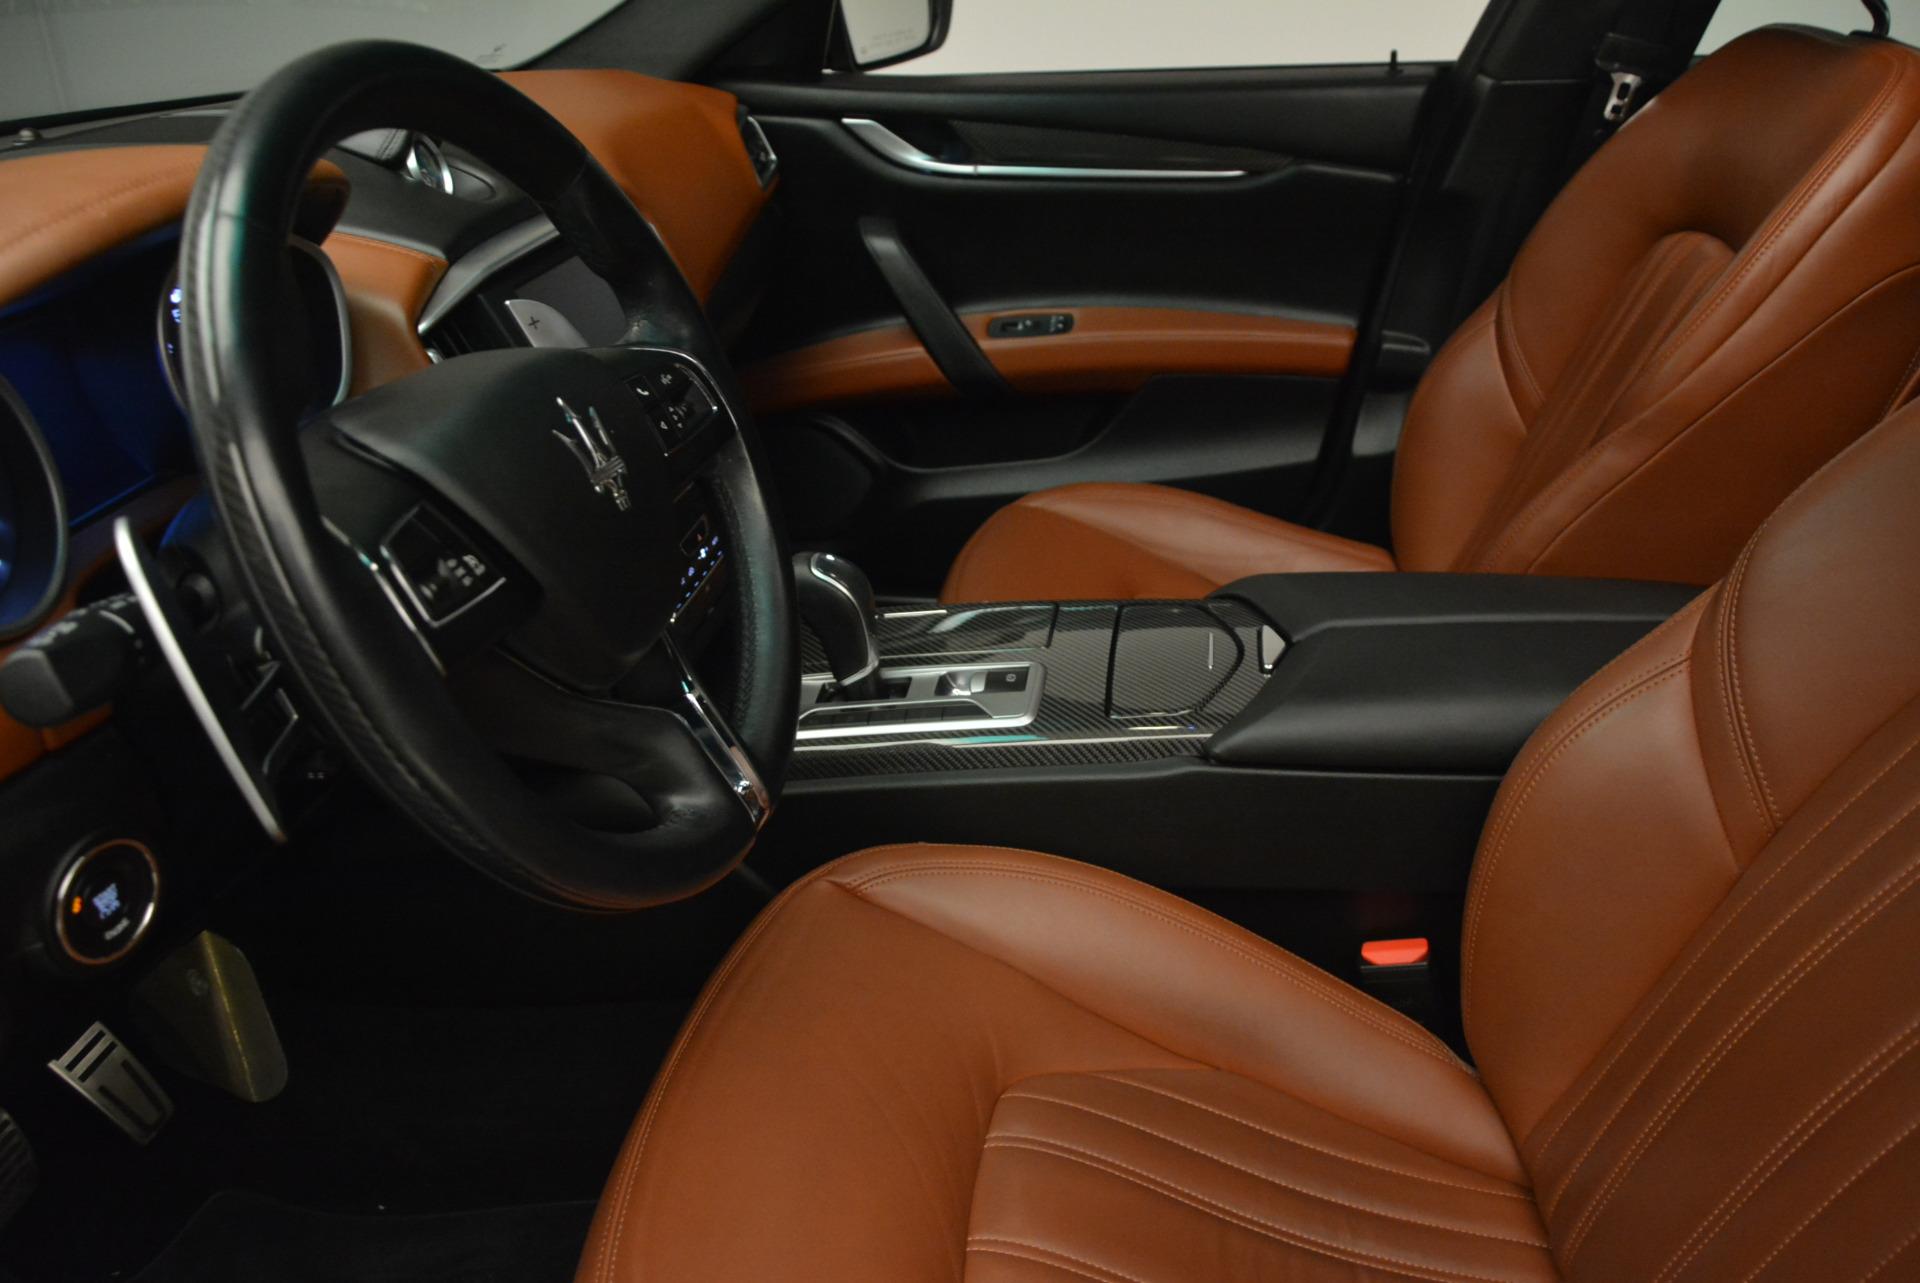 Used 2014 Maserati Ghibli S Q4 For Sale In Westport, CT 805_p14